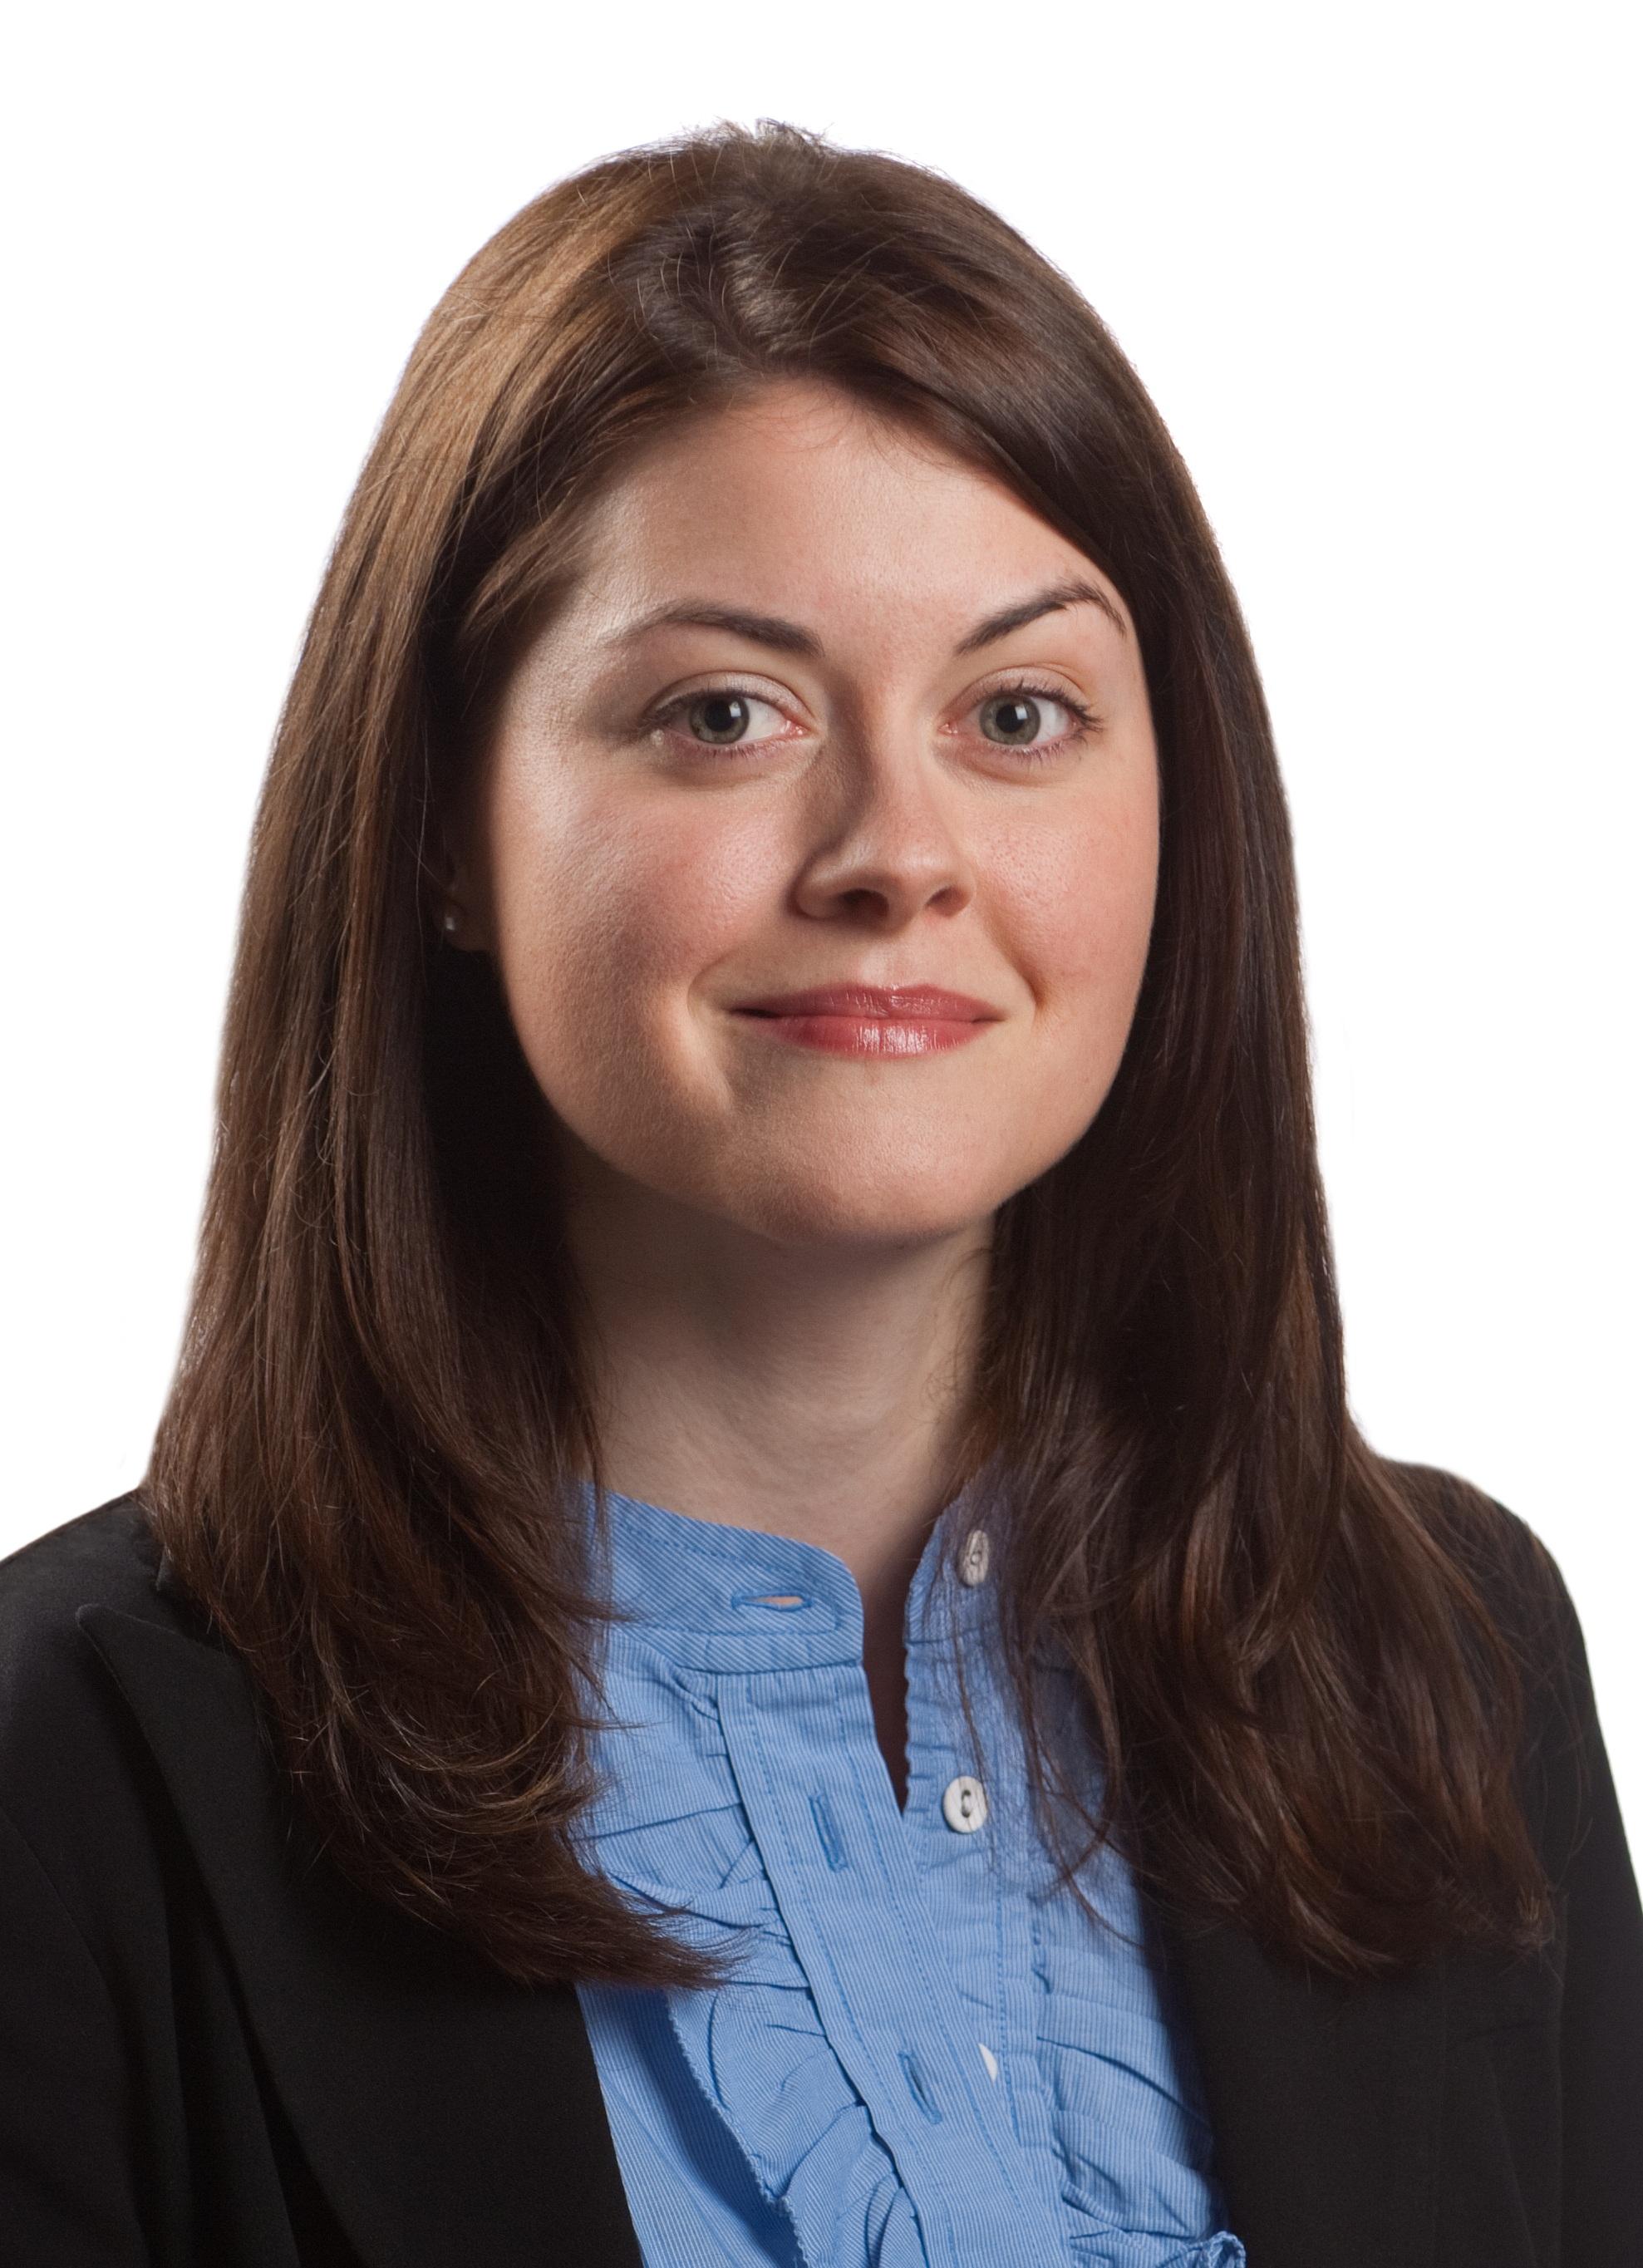 Vanessa MacDonnell